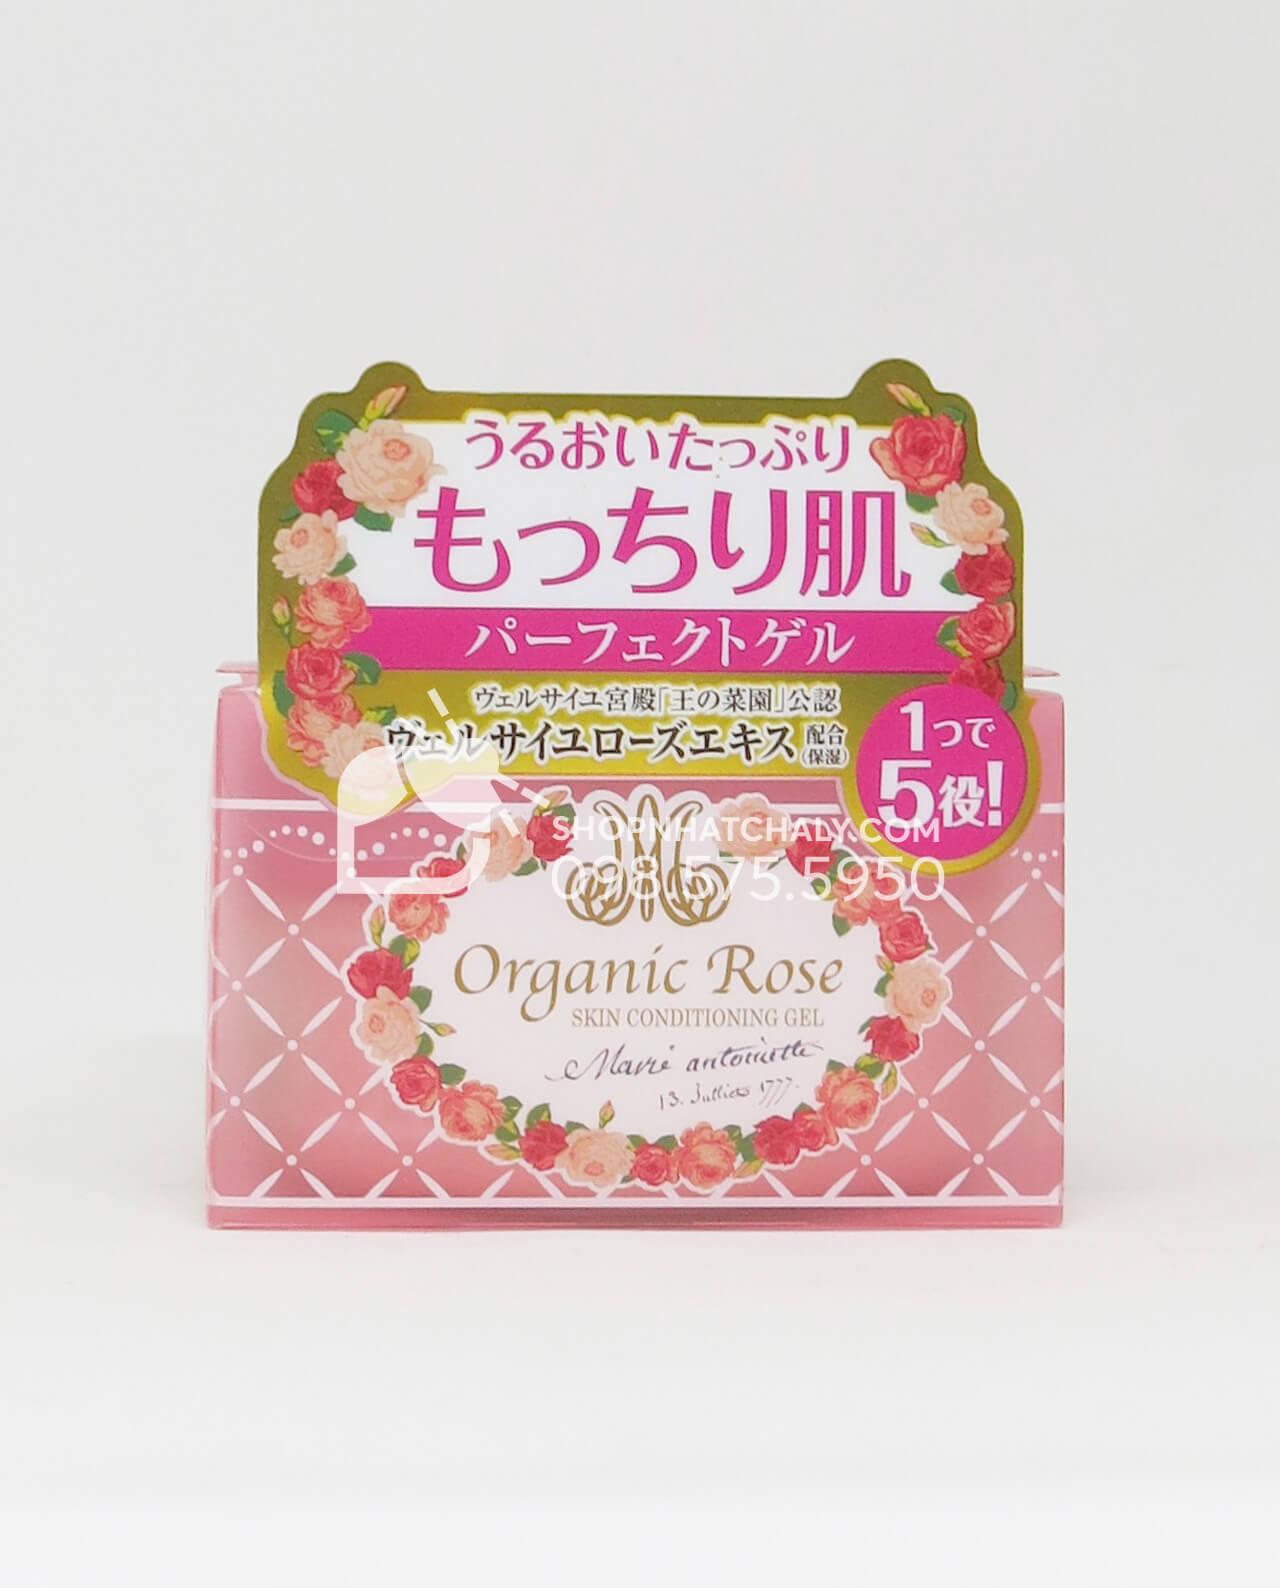 Kem dưỡng da Organic Rose Meishoku Conditioning Gel 90gr - Hồng dưỡng ẩm se khít lỗ chân lông